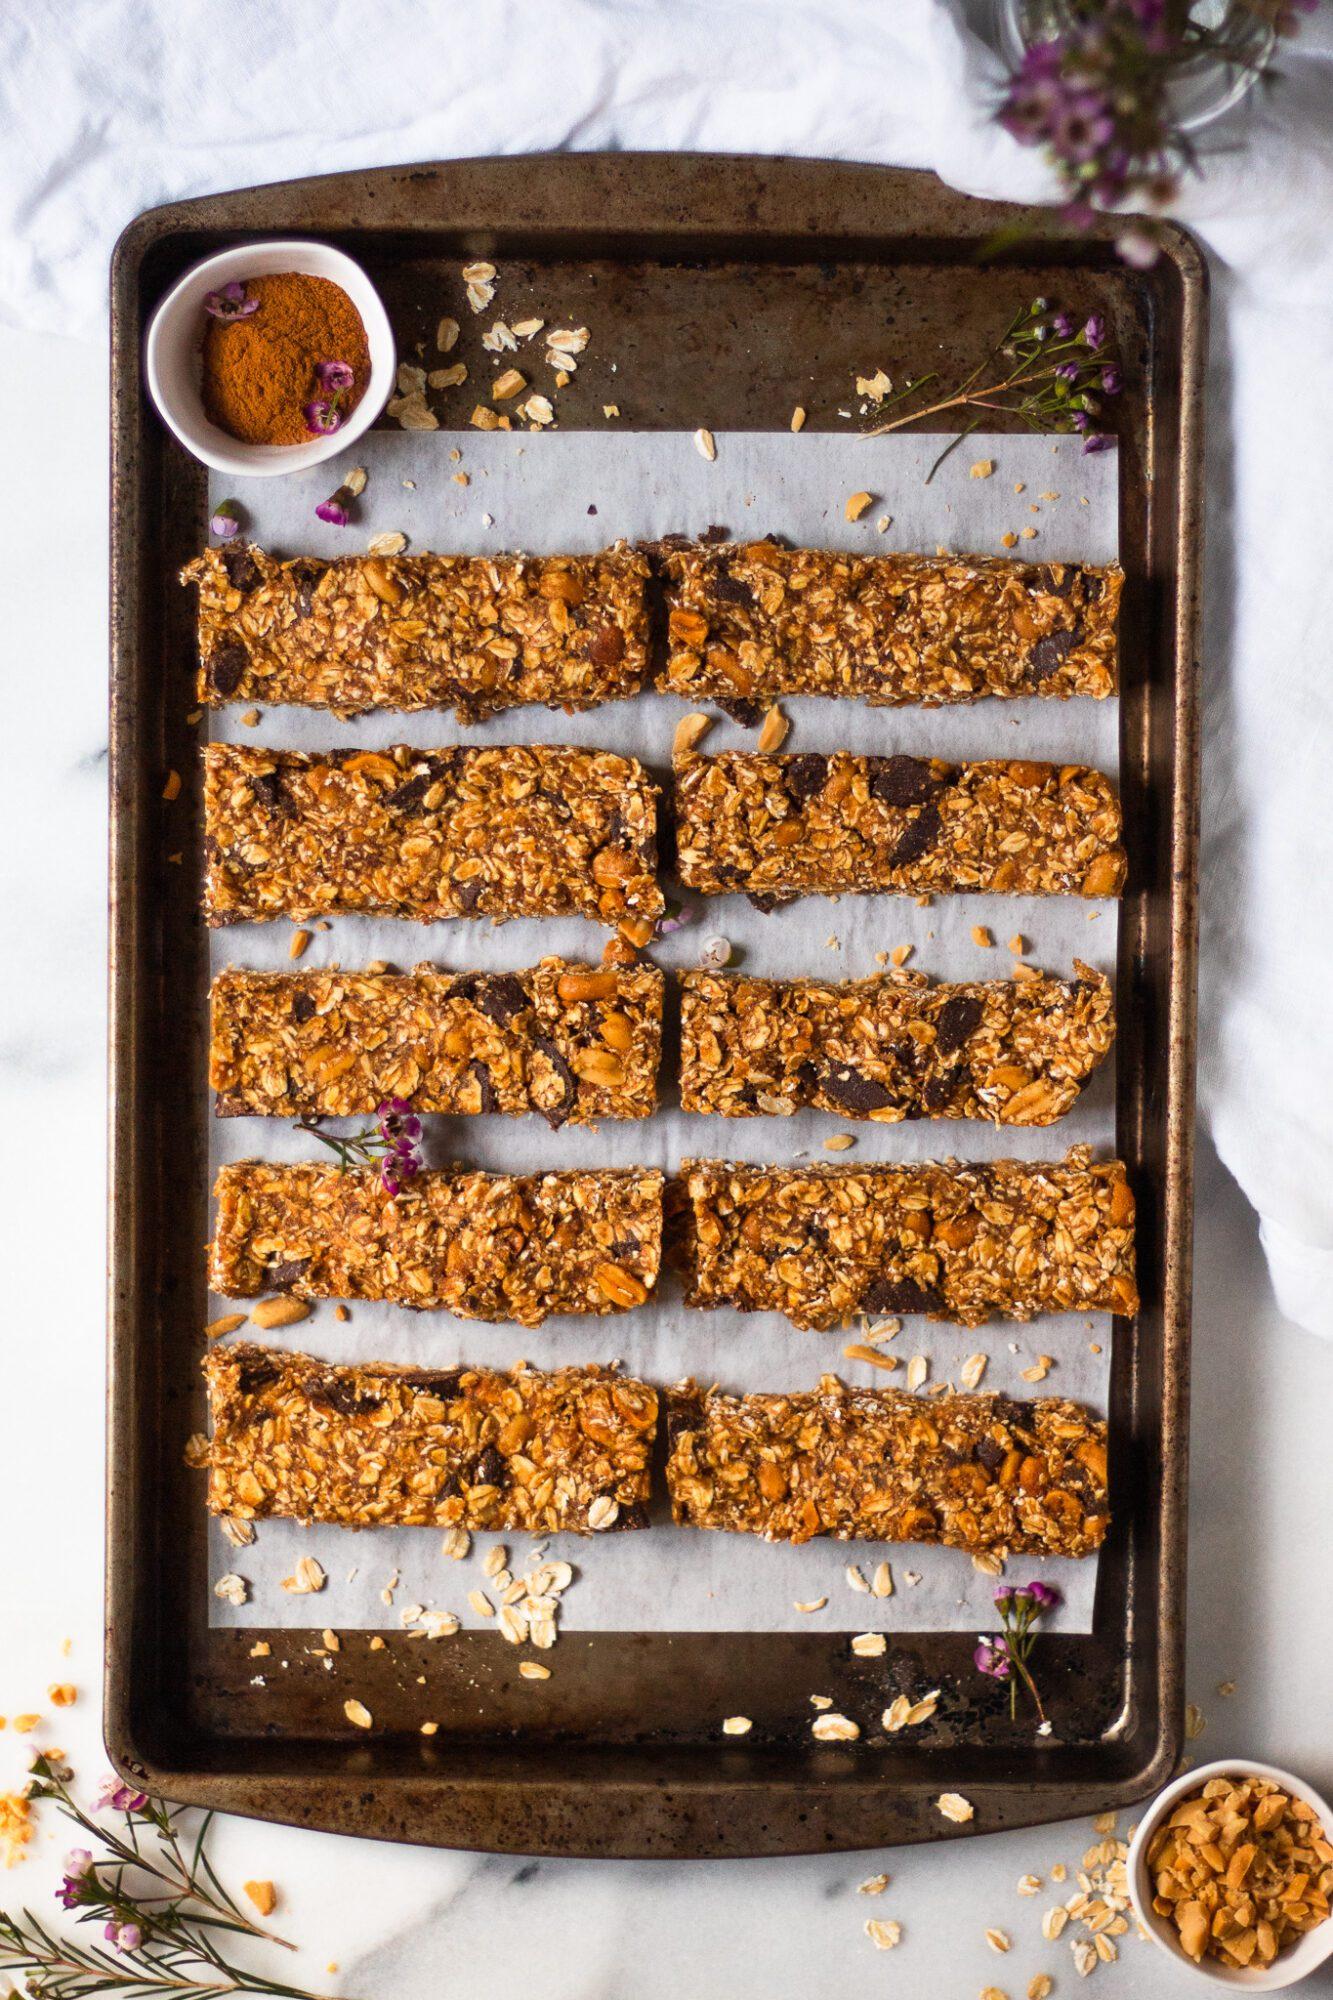 granola bars neatly arranged on baking sheet